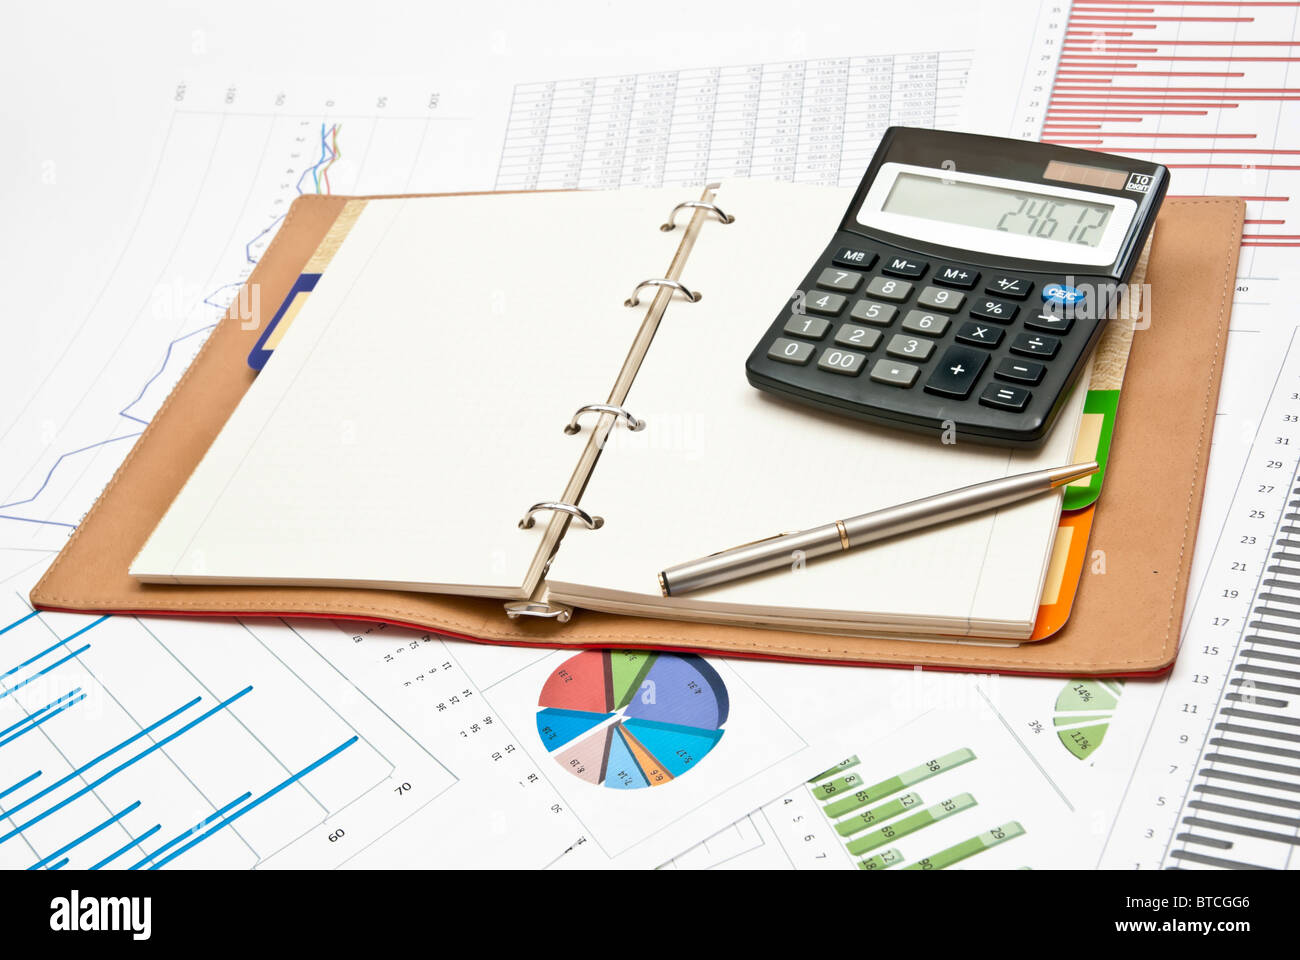 Finances - Stock Image